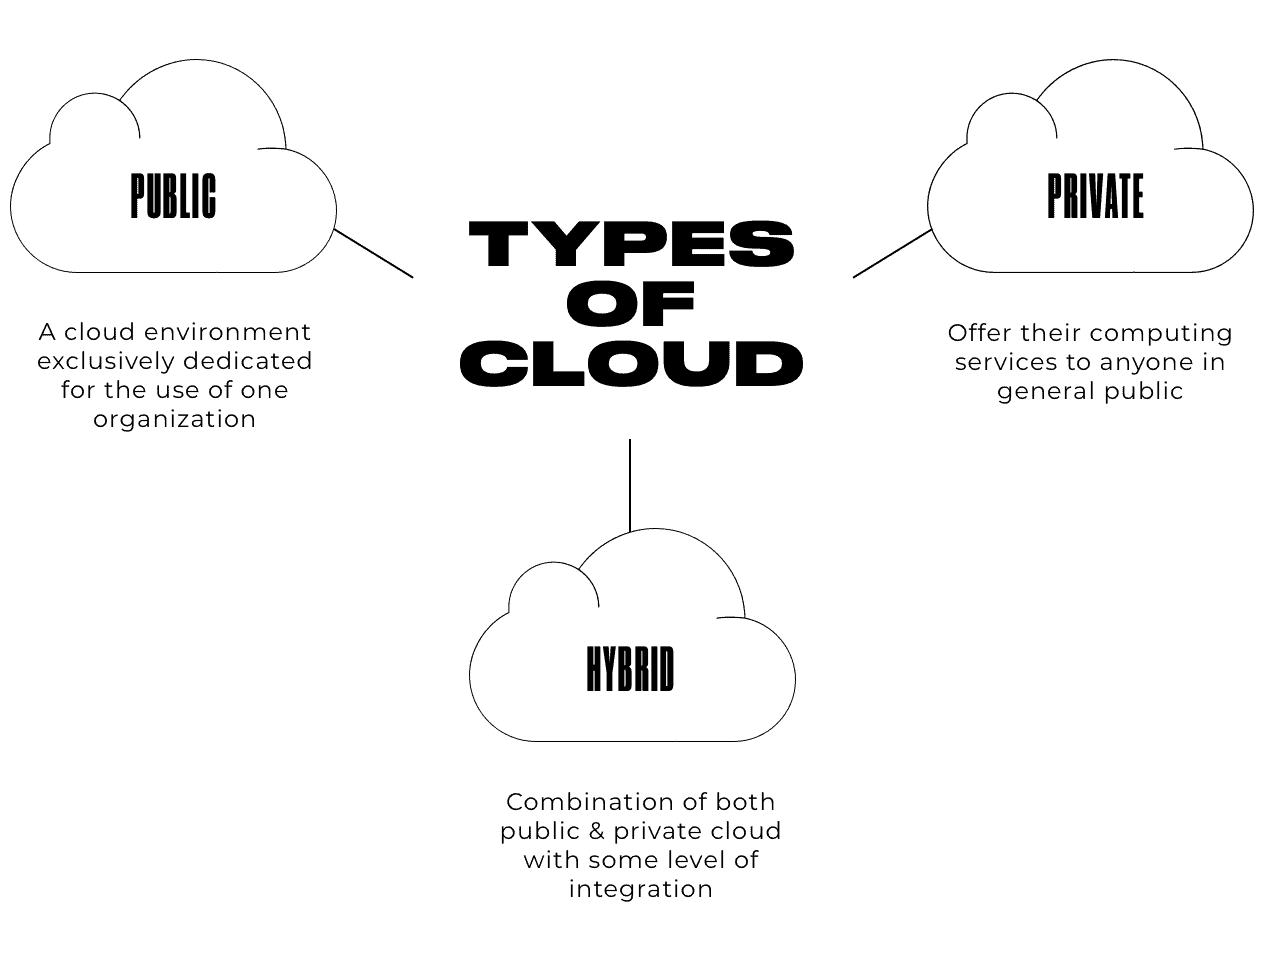 types of cloud scheme: public, private, hybrid